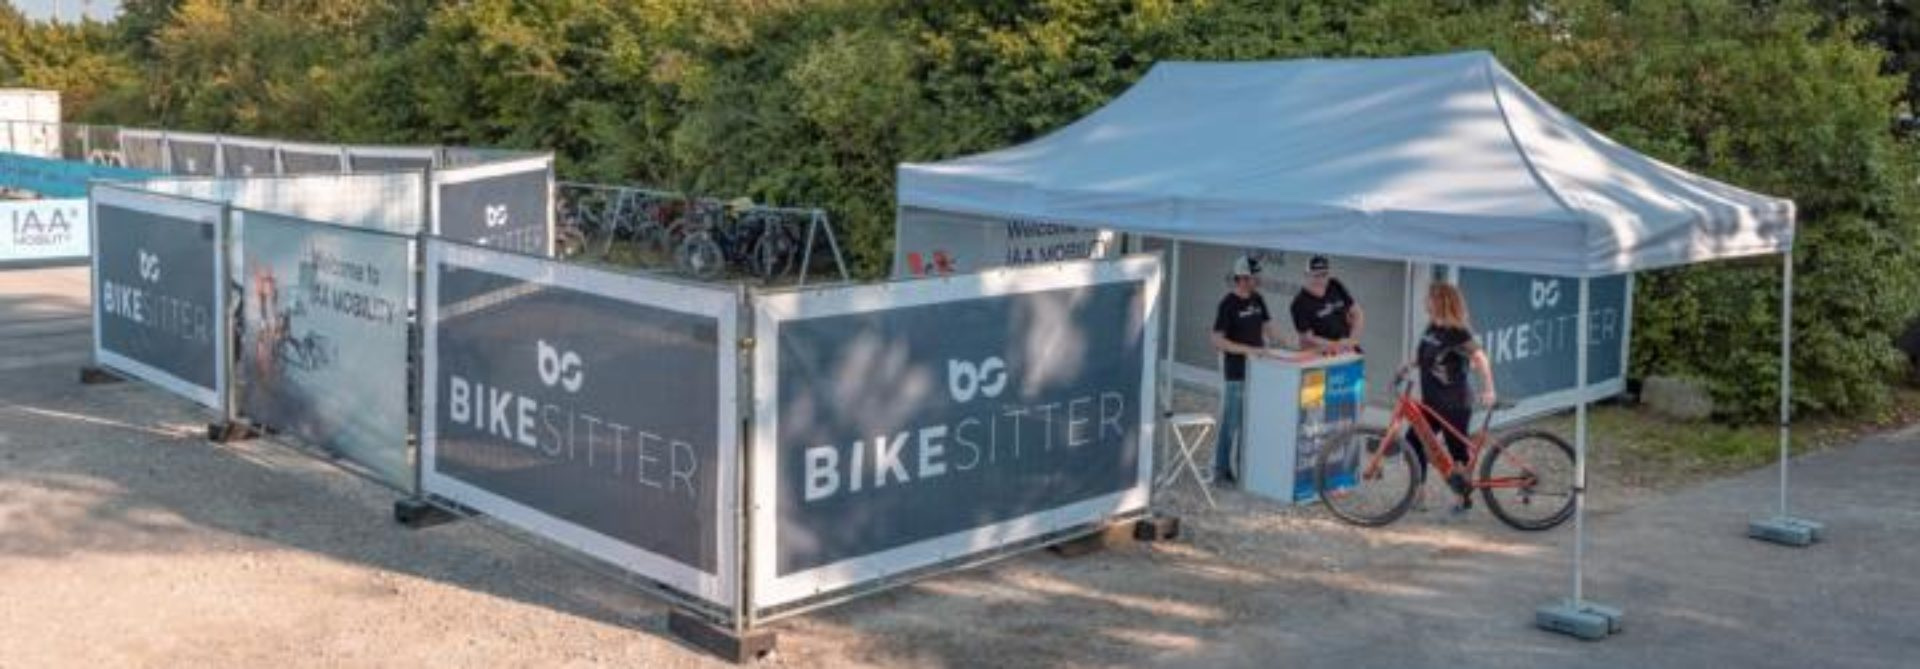 Bikesitter